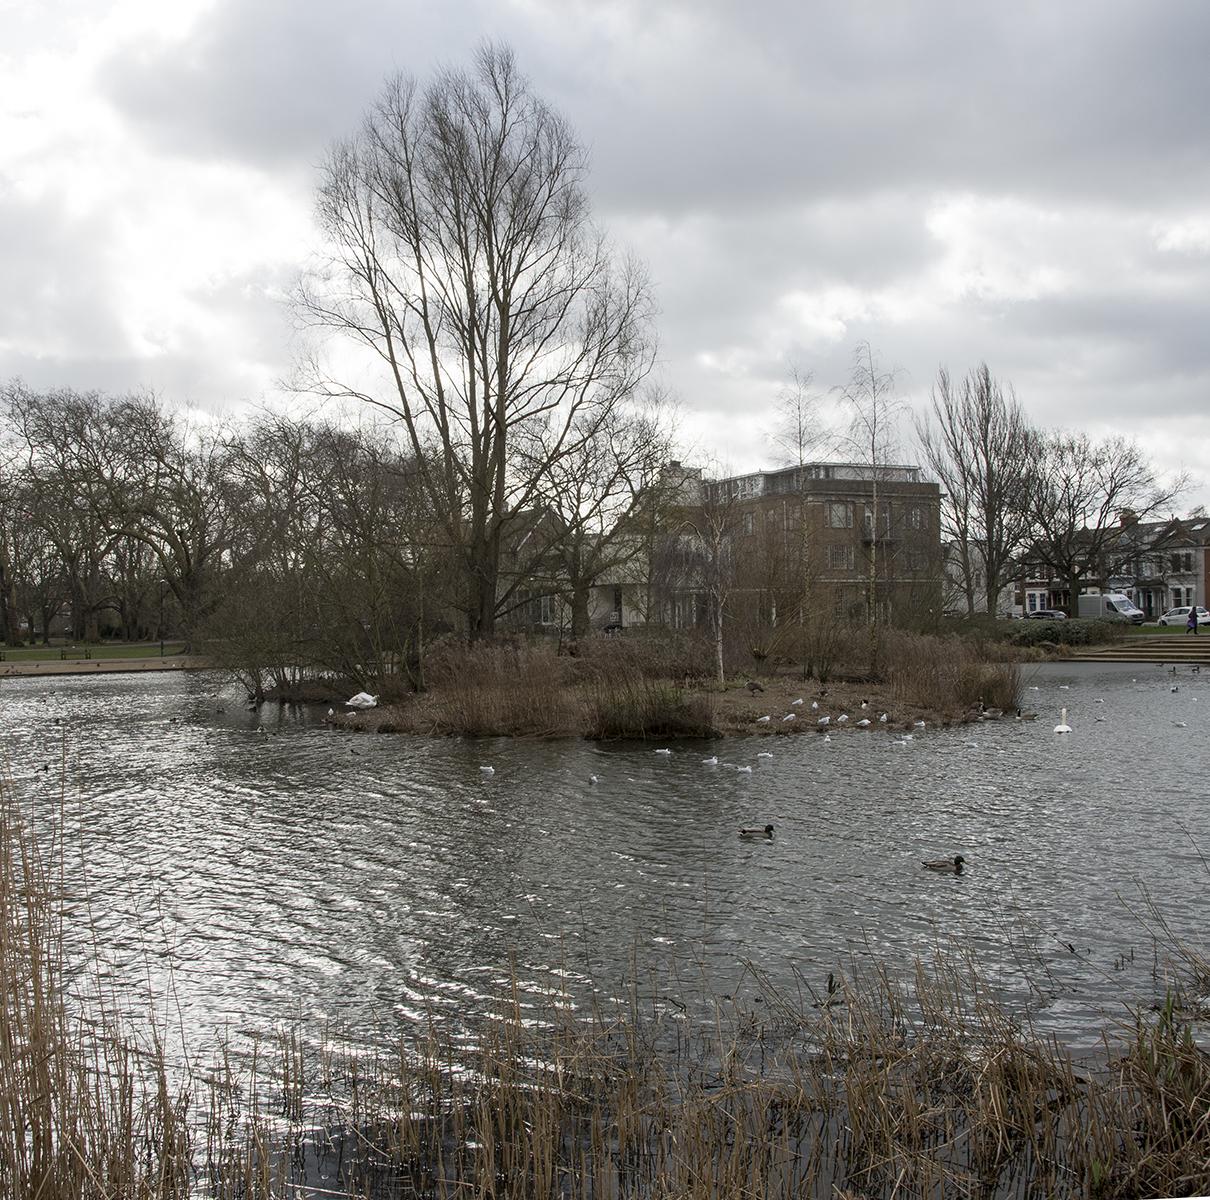 20170223_Richmond_Barnes_Landscape_Winter_Barnes-Pond-on-a-windy-day